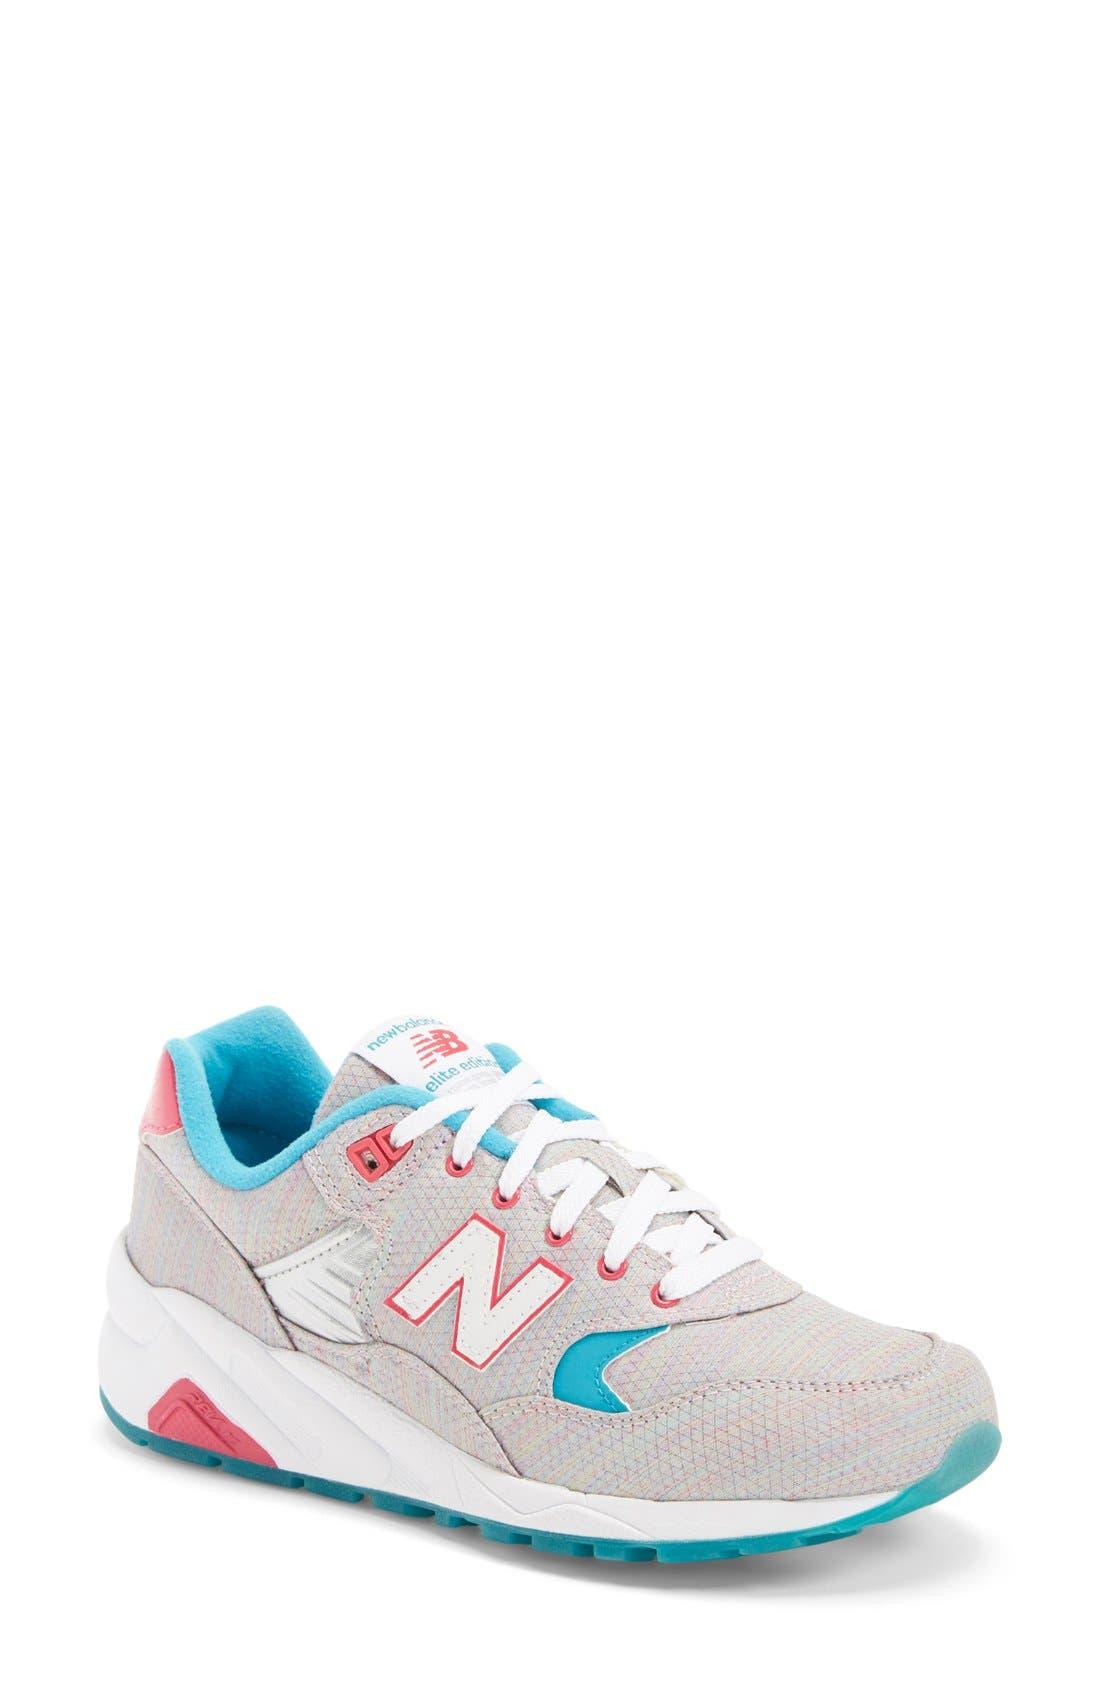 Alternate Image 1 Selected - New Balance '580' Sneaker (Women)